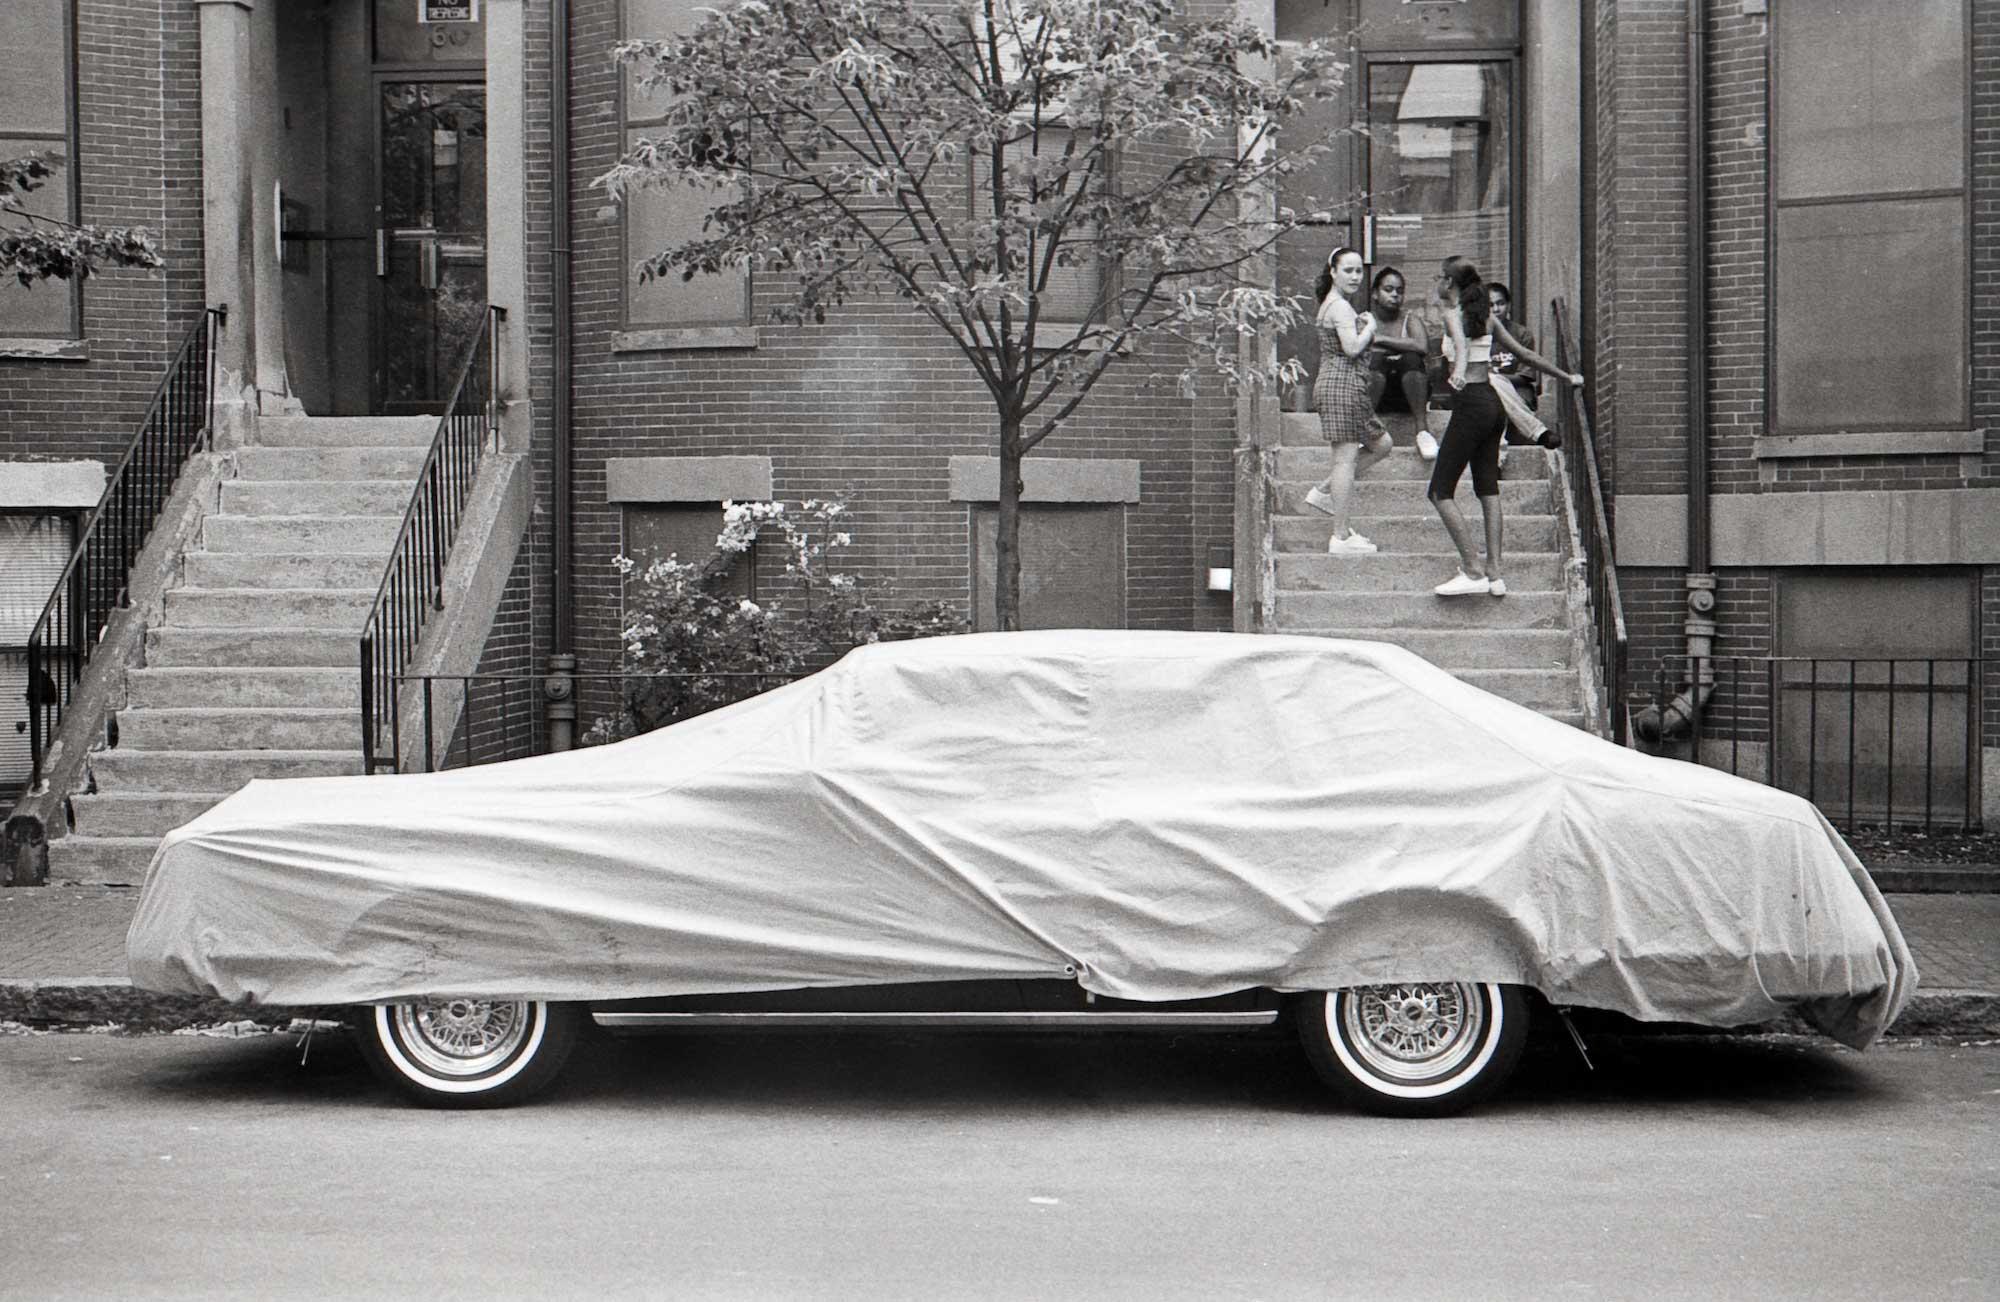 Granary Arts Todd Sanchioni The Covered Cars